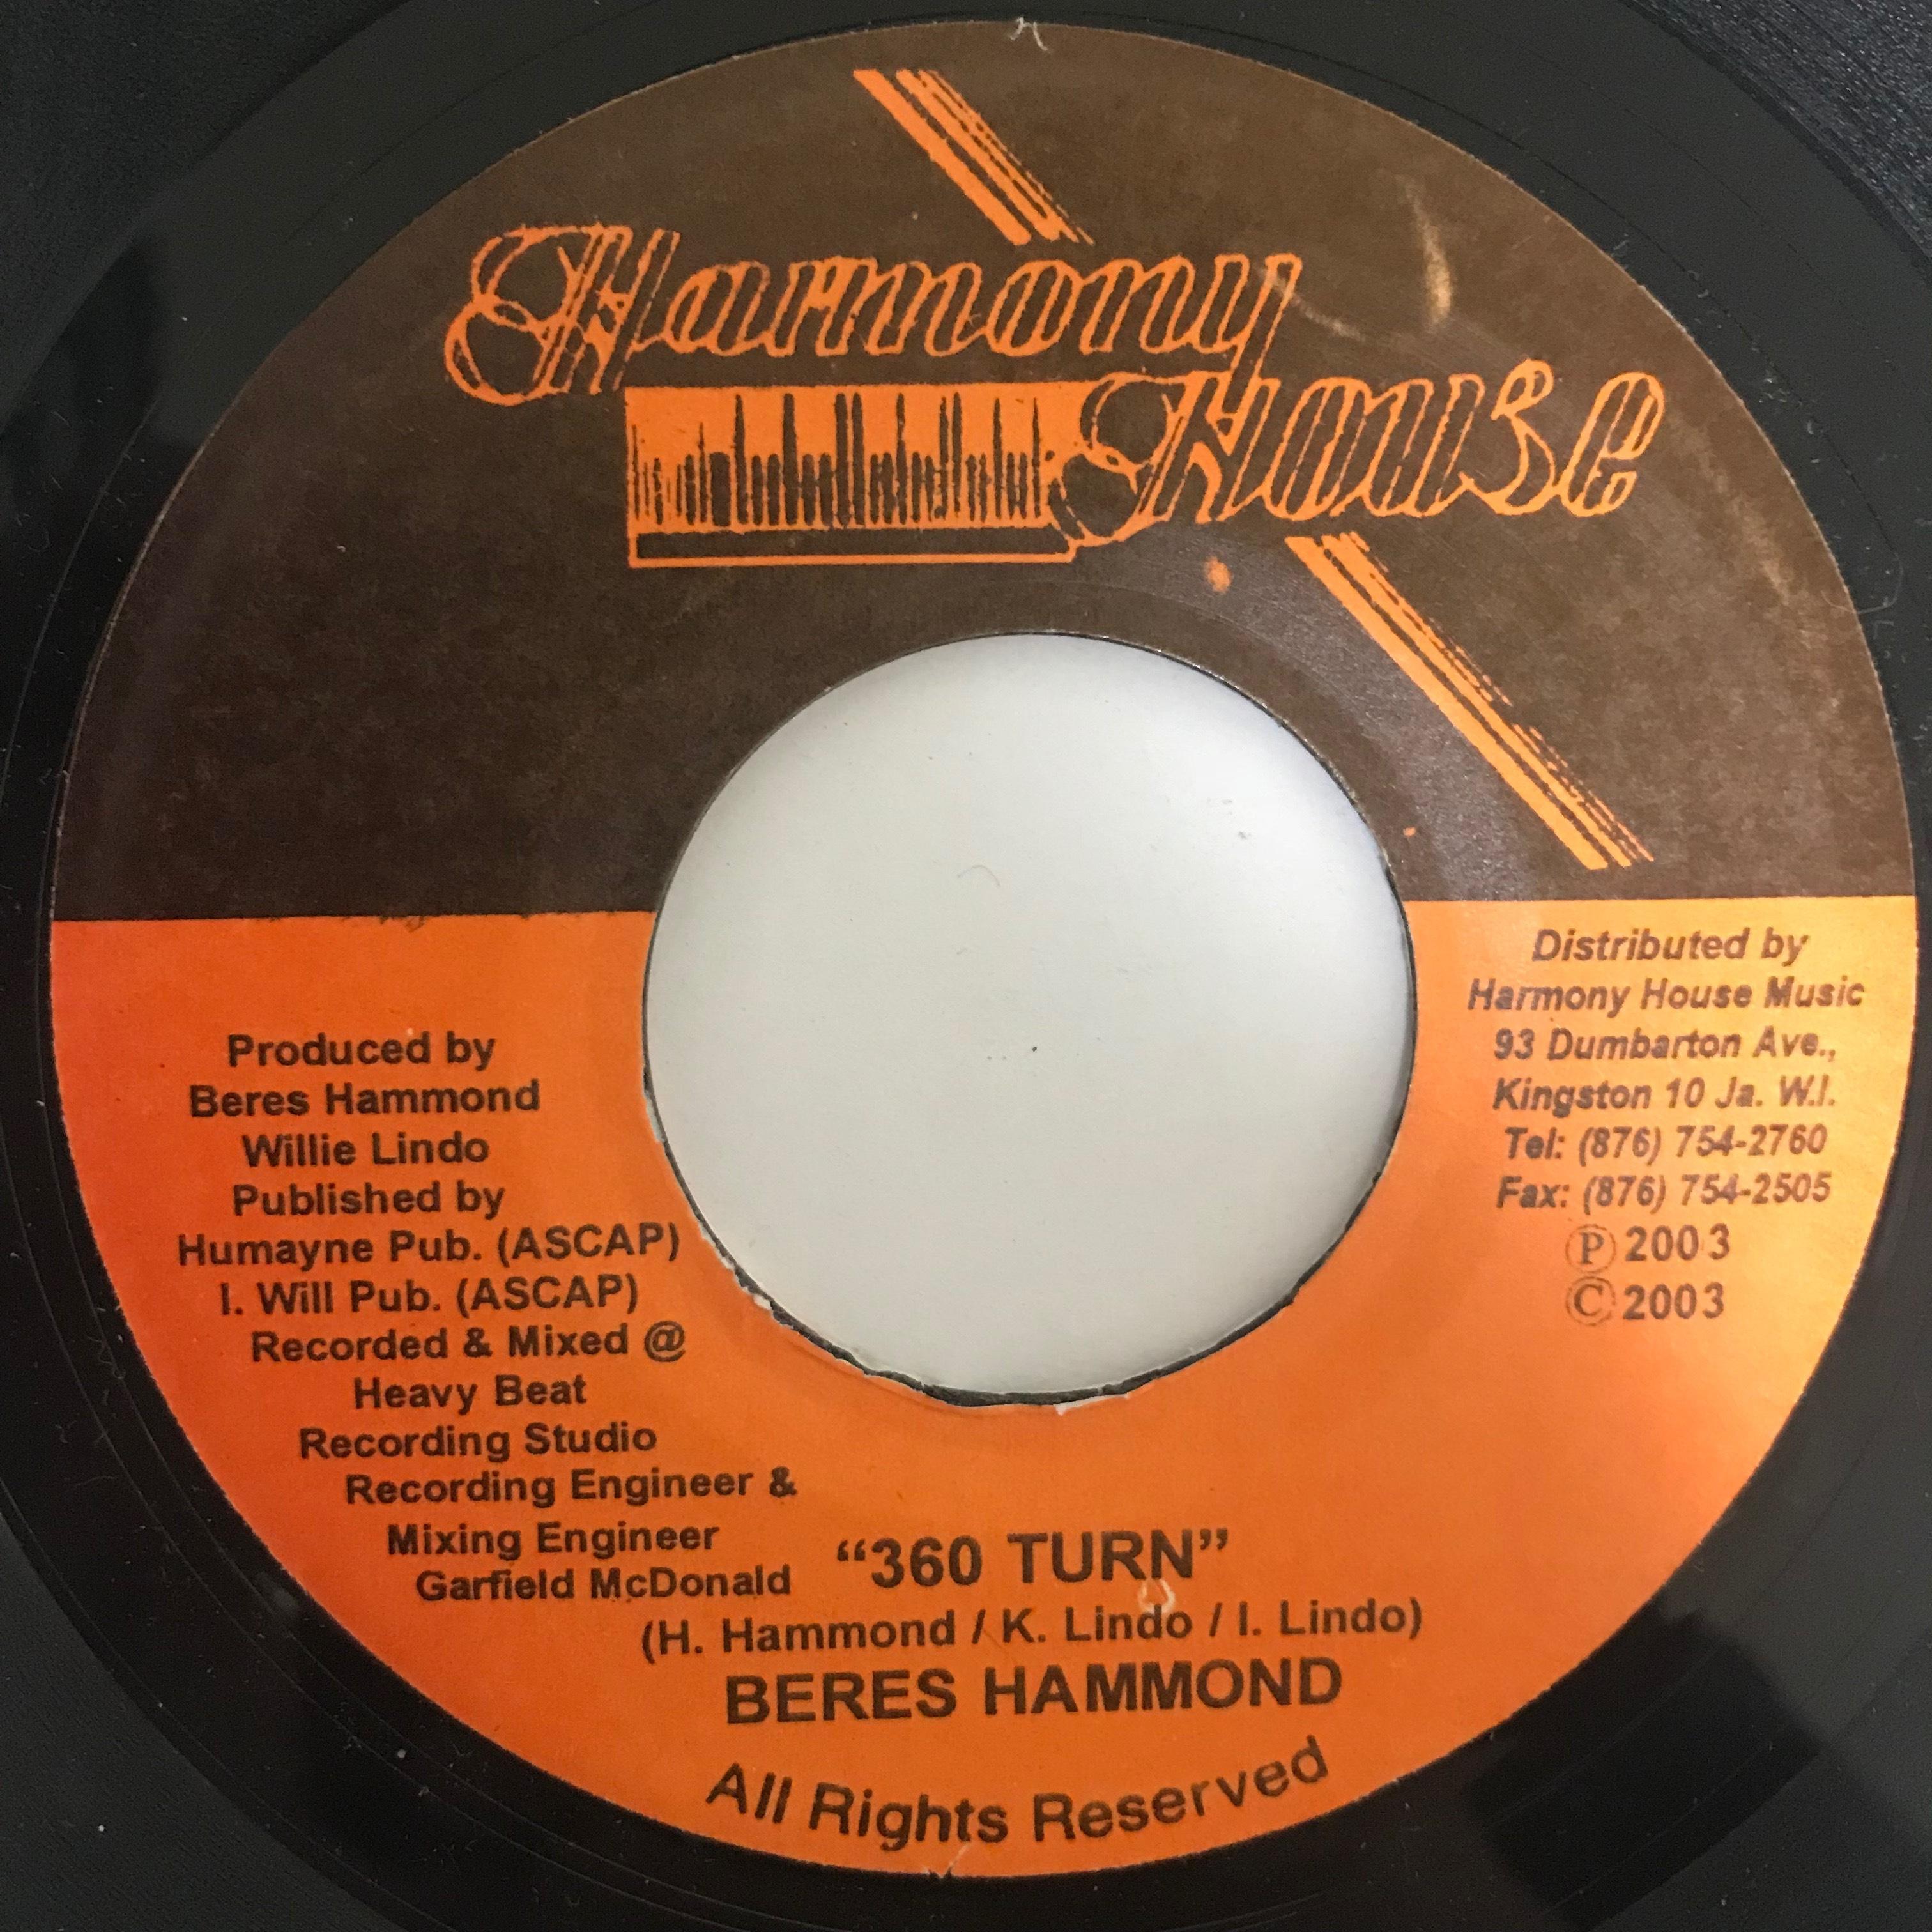 Beres Hammond - 360 Turn【7-10776】